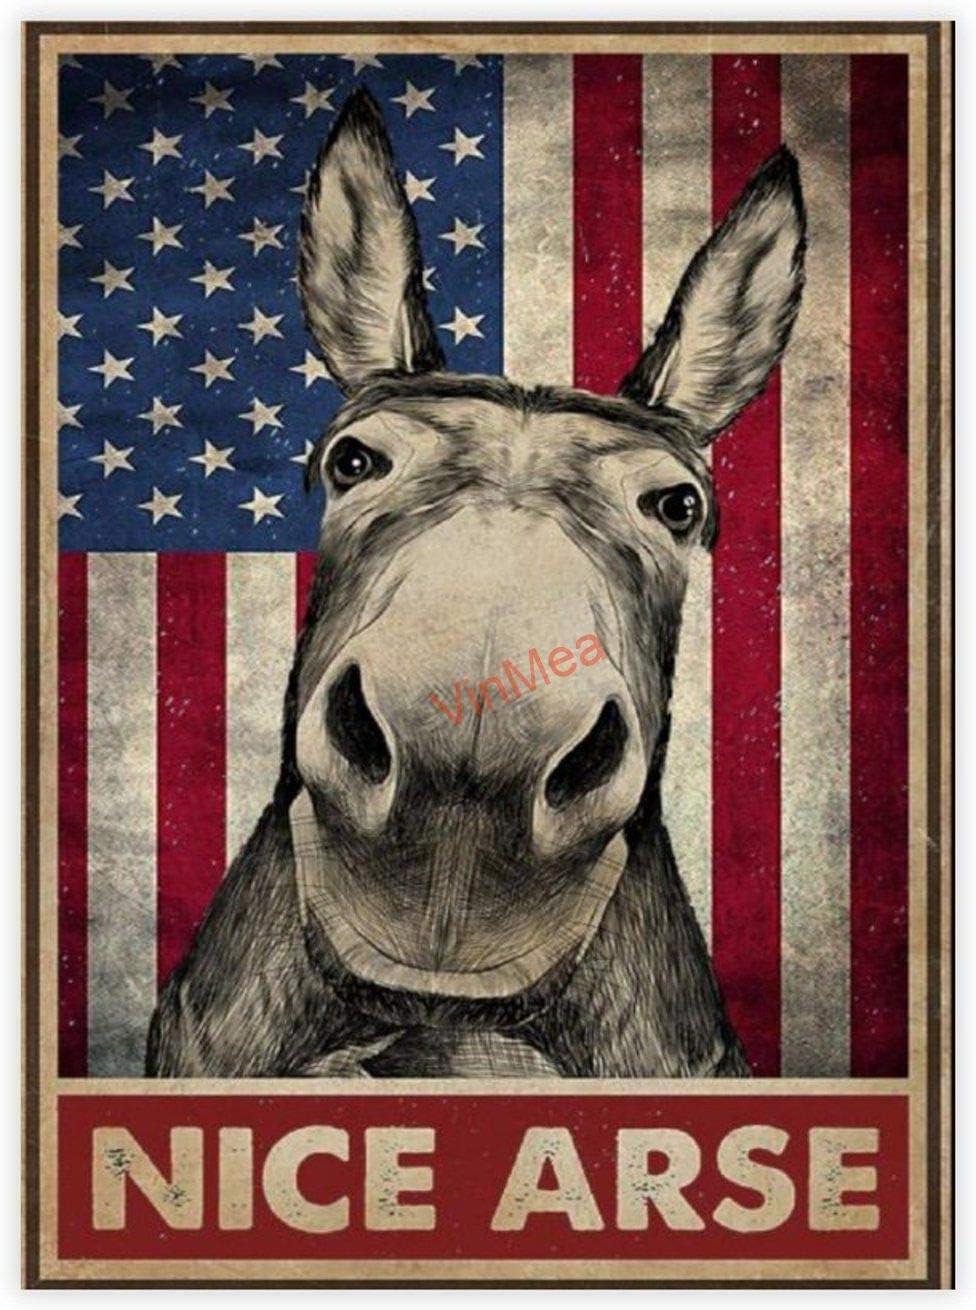 VinMea Decorative Art Printing Poster Donkey Nice Arse American Flag Poster - Wall Art Print Home Decor 16 X 24 Inch Unframed